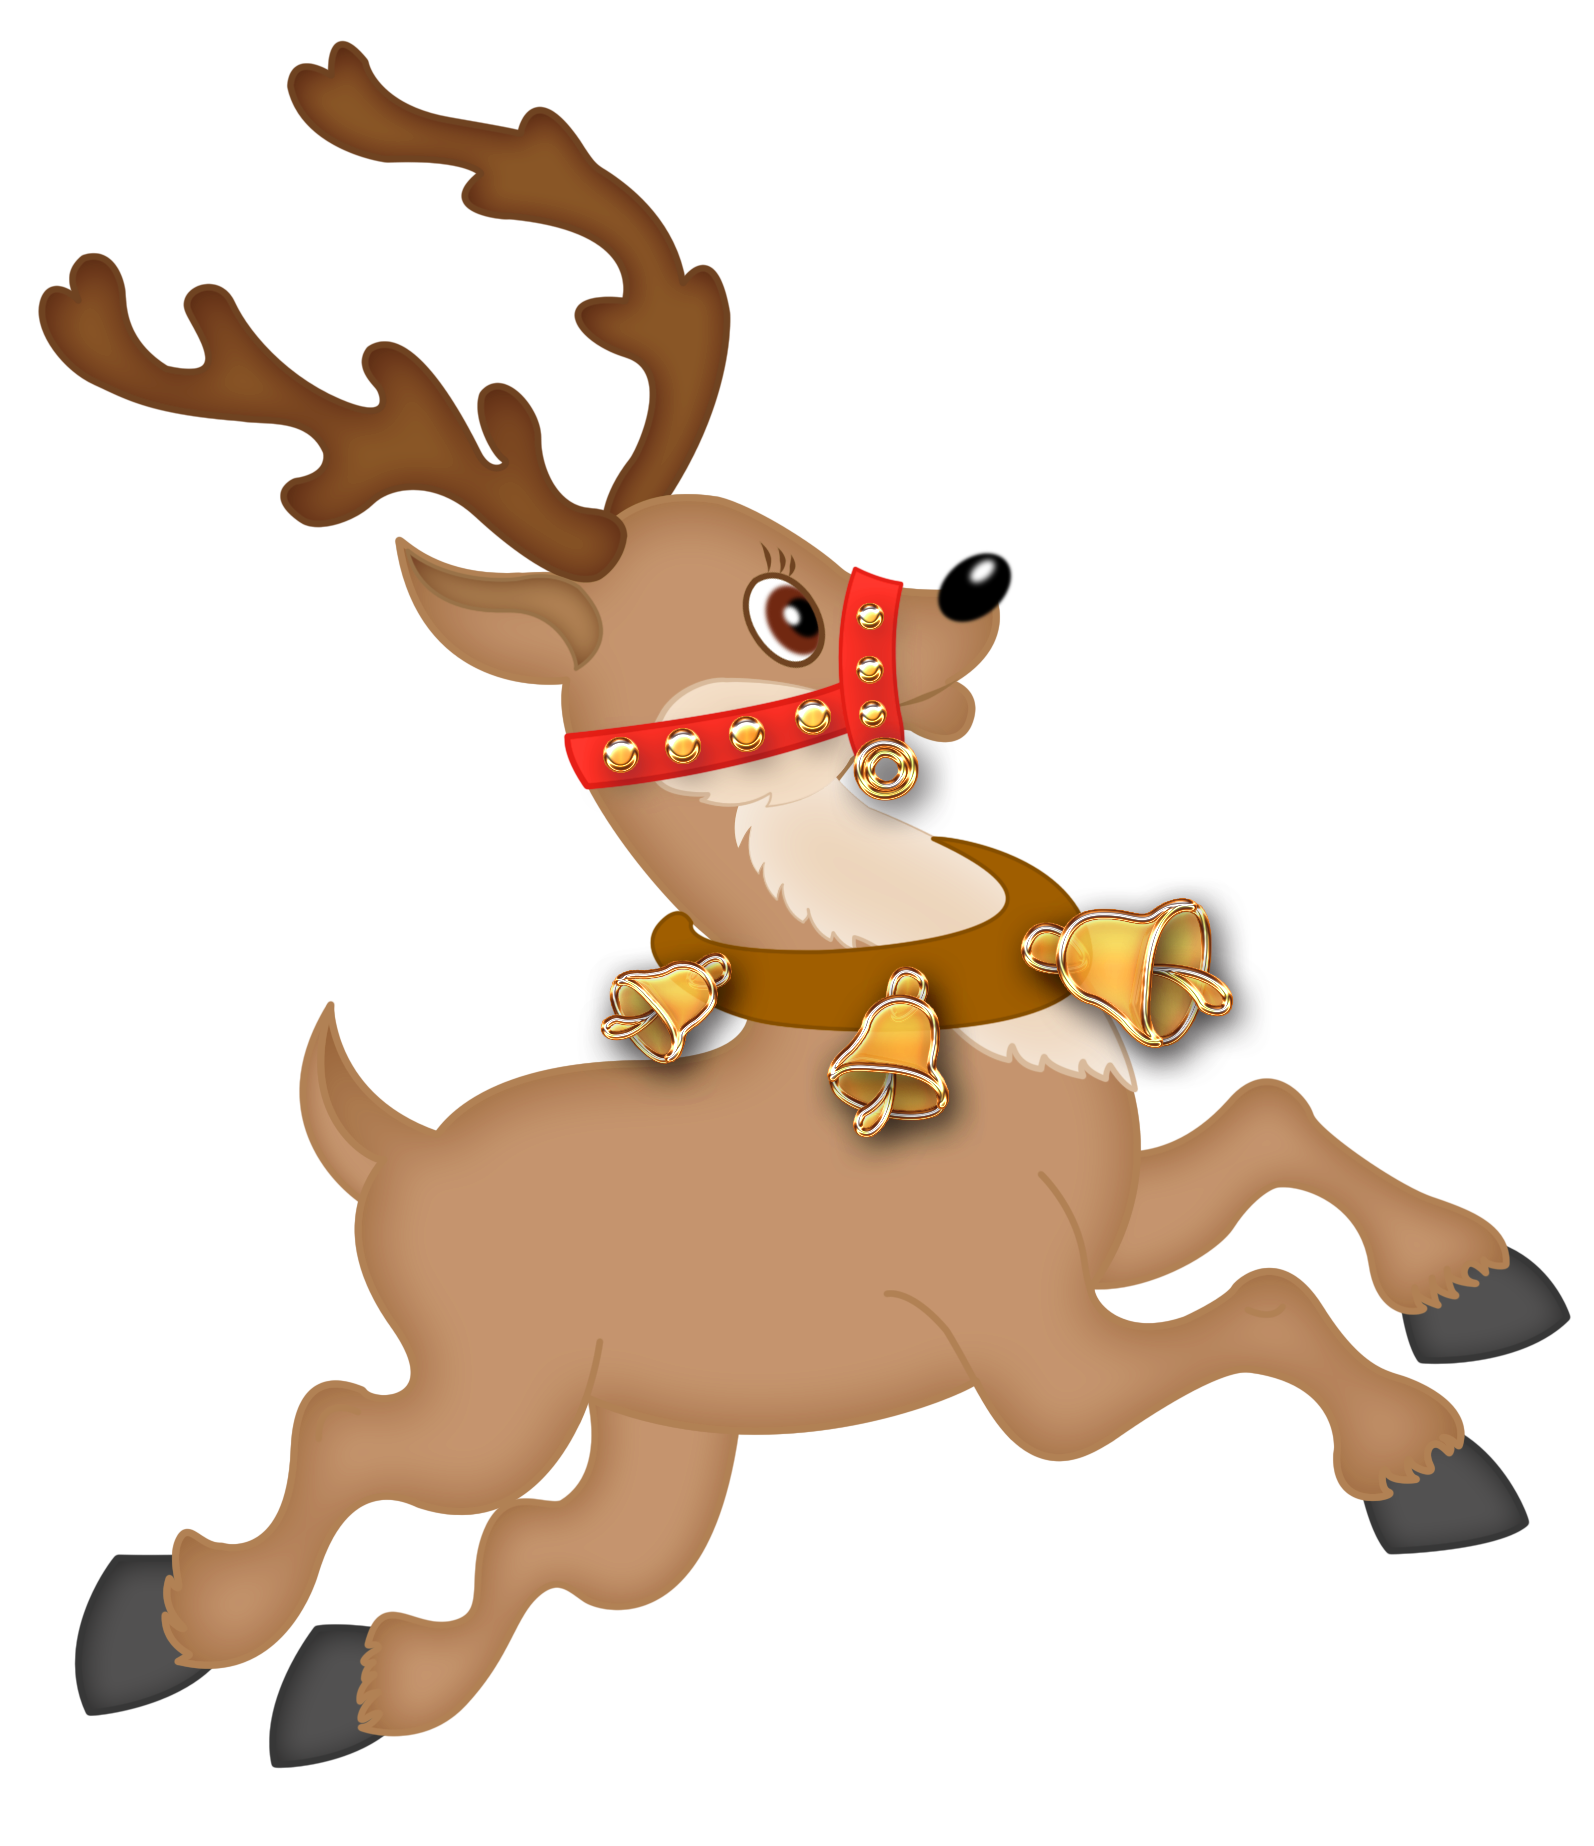 1594x1846 Cute Reindeer Png Clipartu200b Gallery Yopriceville